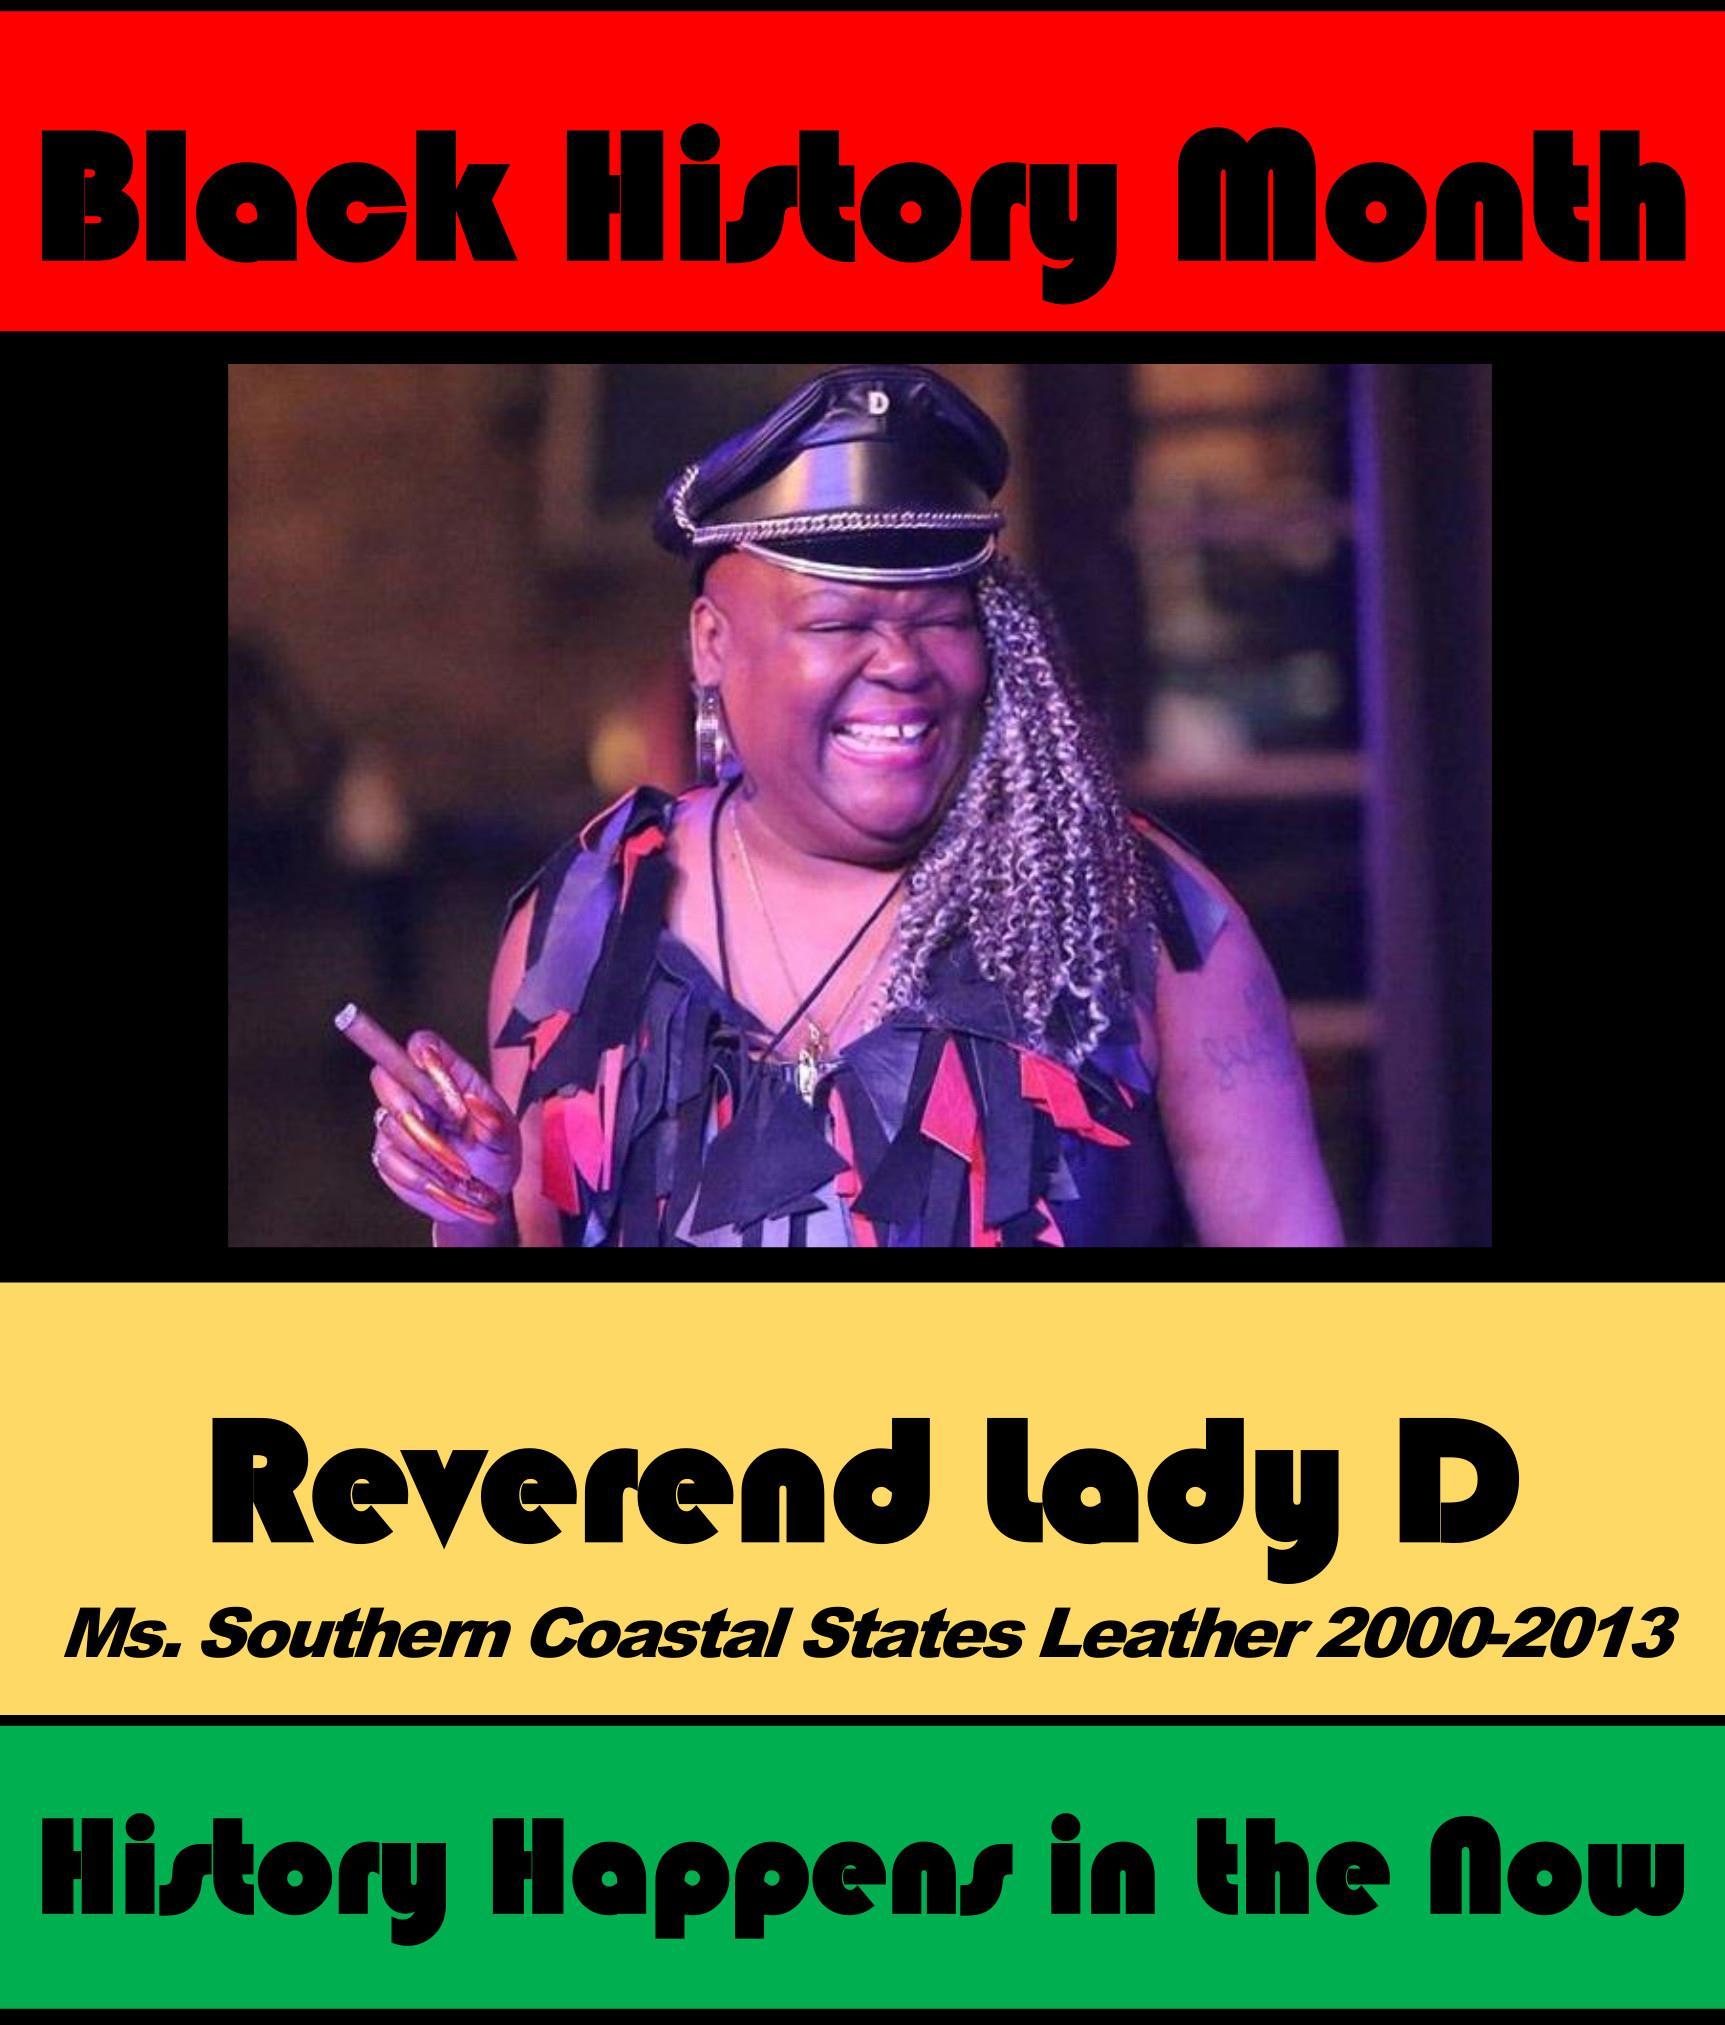 Reverend Lady D #POCKLEBlackHistoryMonth